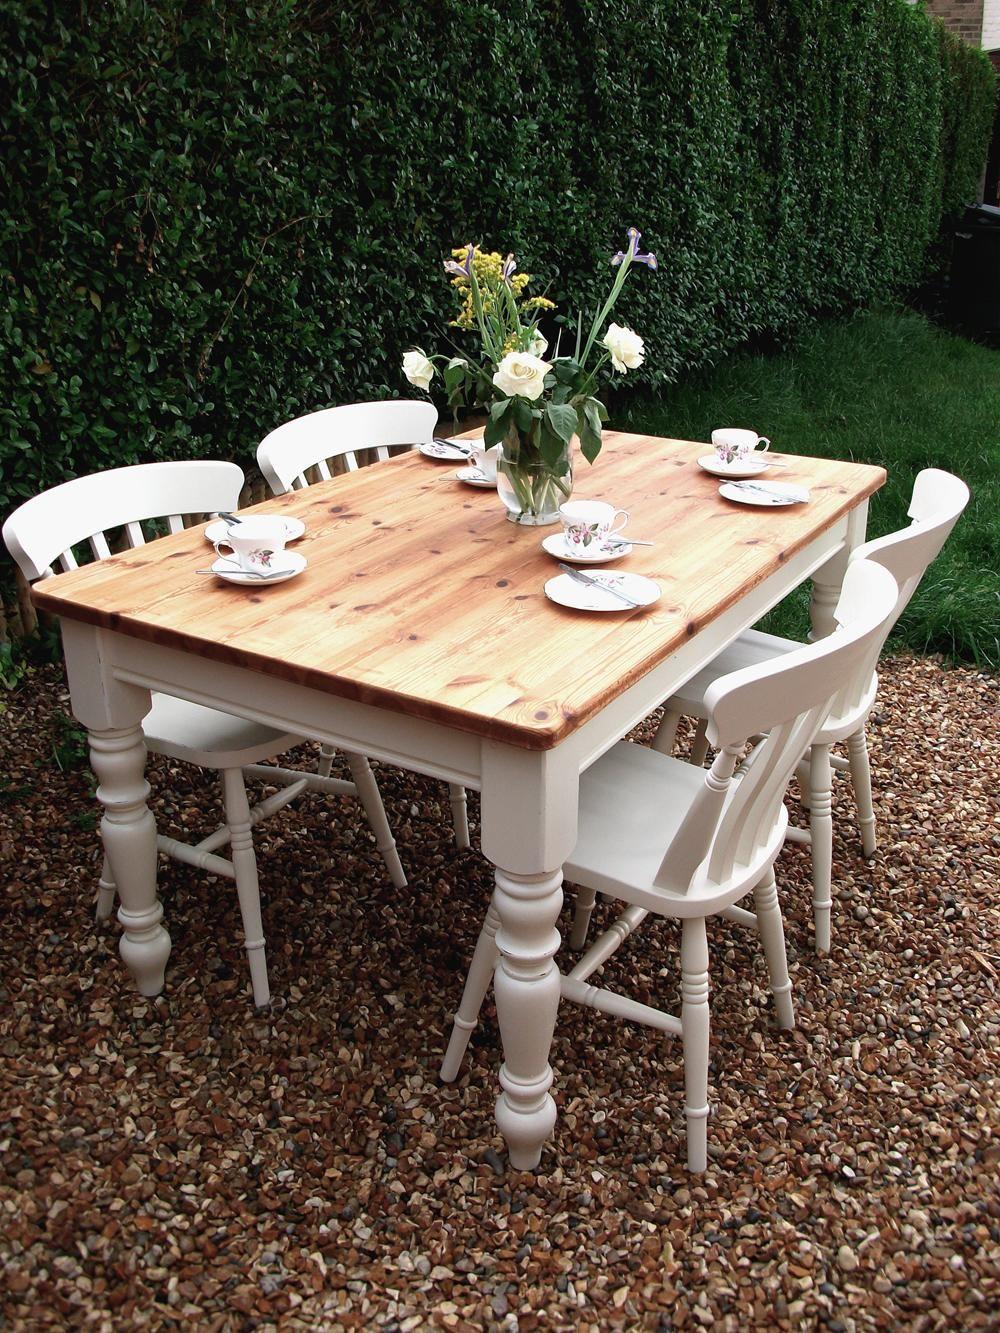 Dscf3039jpg 10001333 shabby chic dining tables